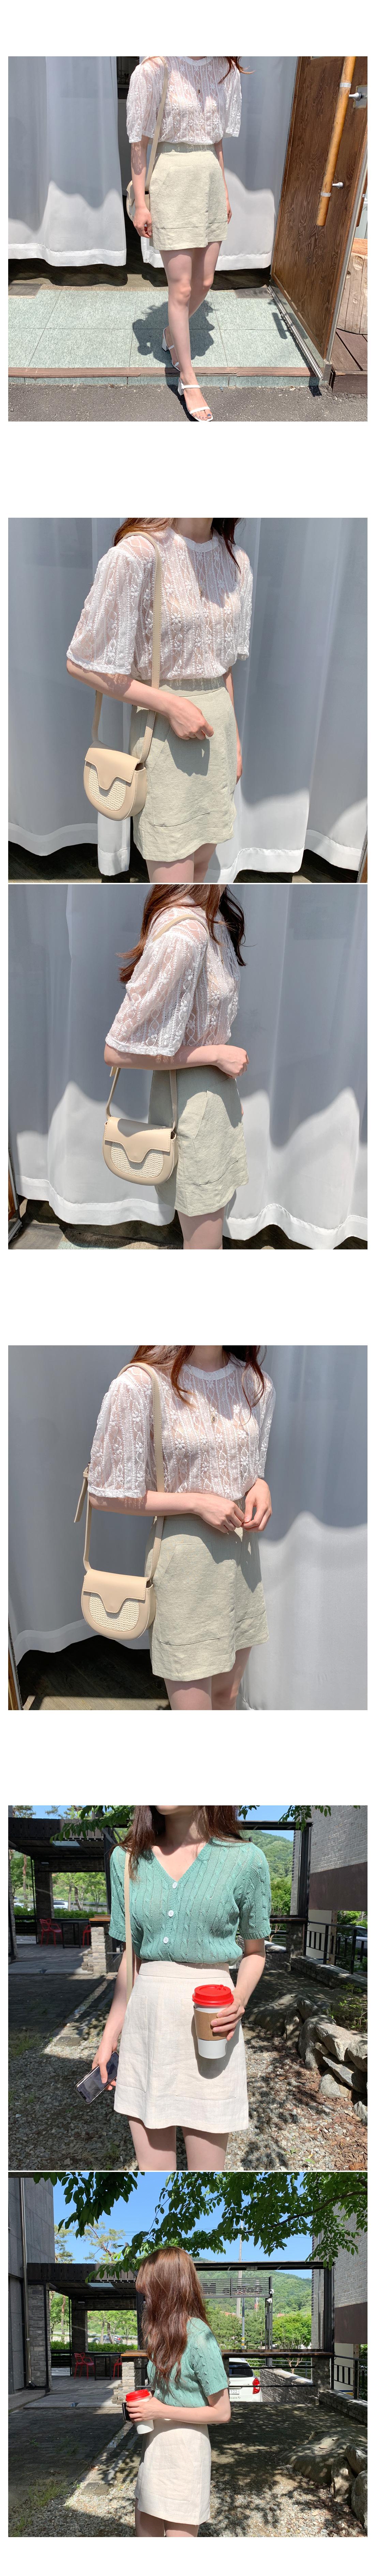 Yoplait Linen Mini Skirt-Mint M Same Day Shipping!